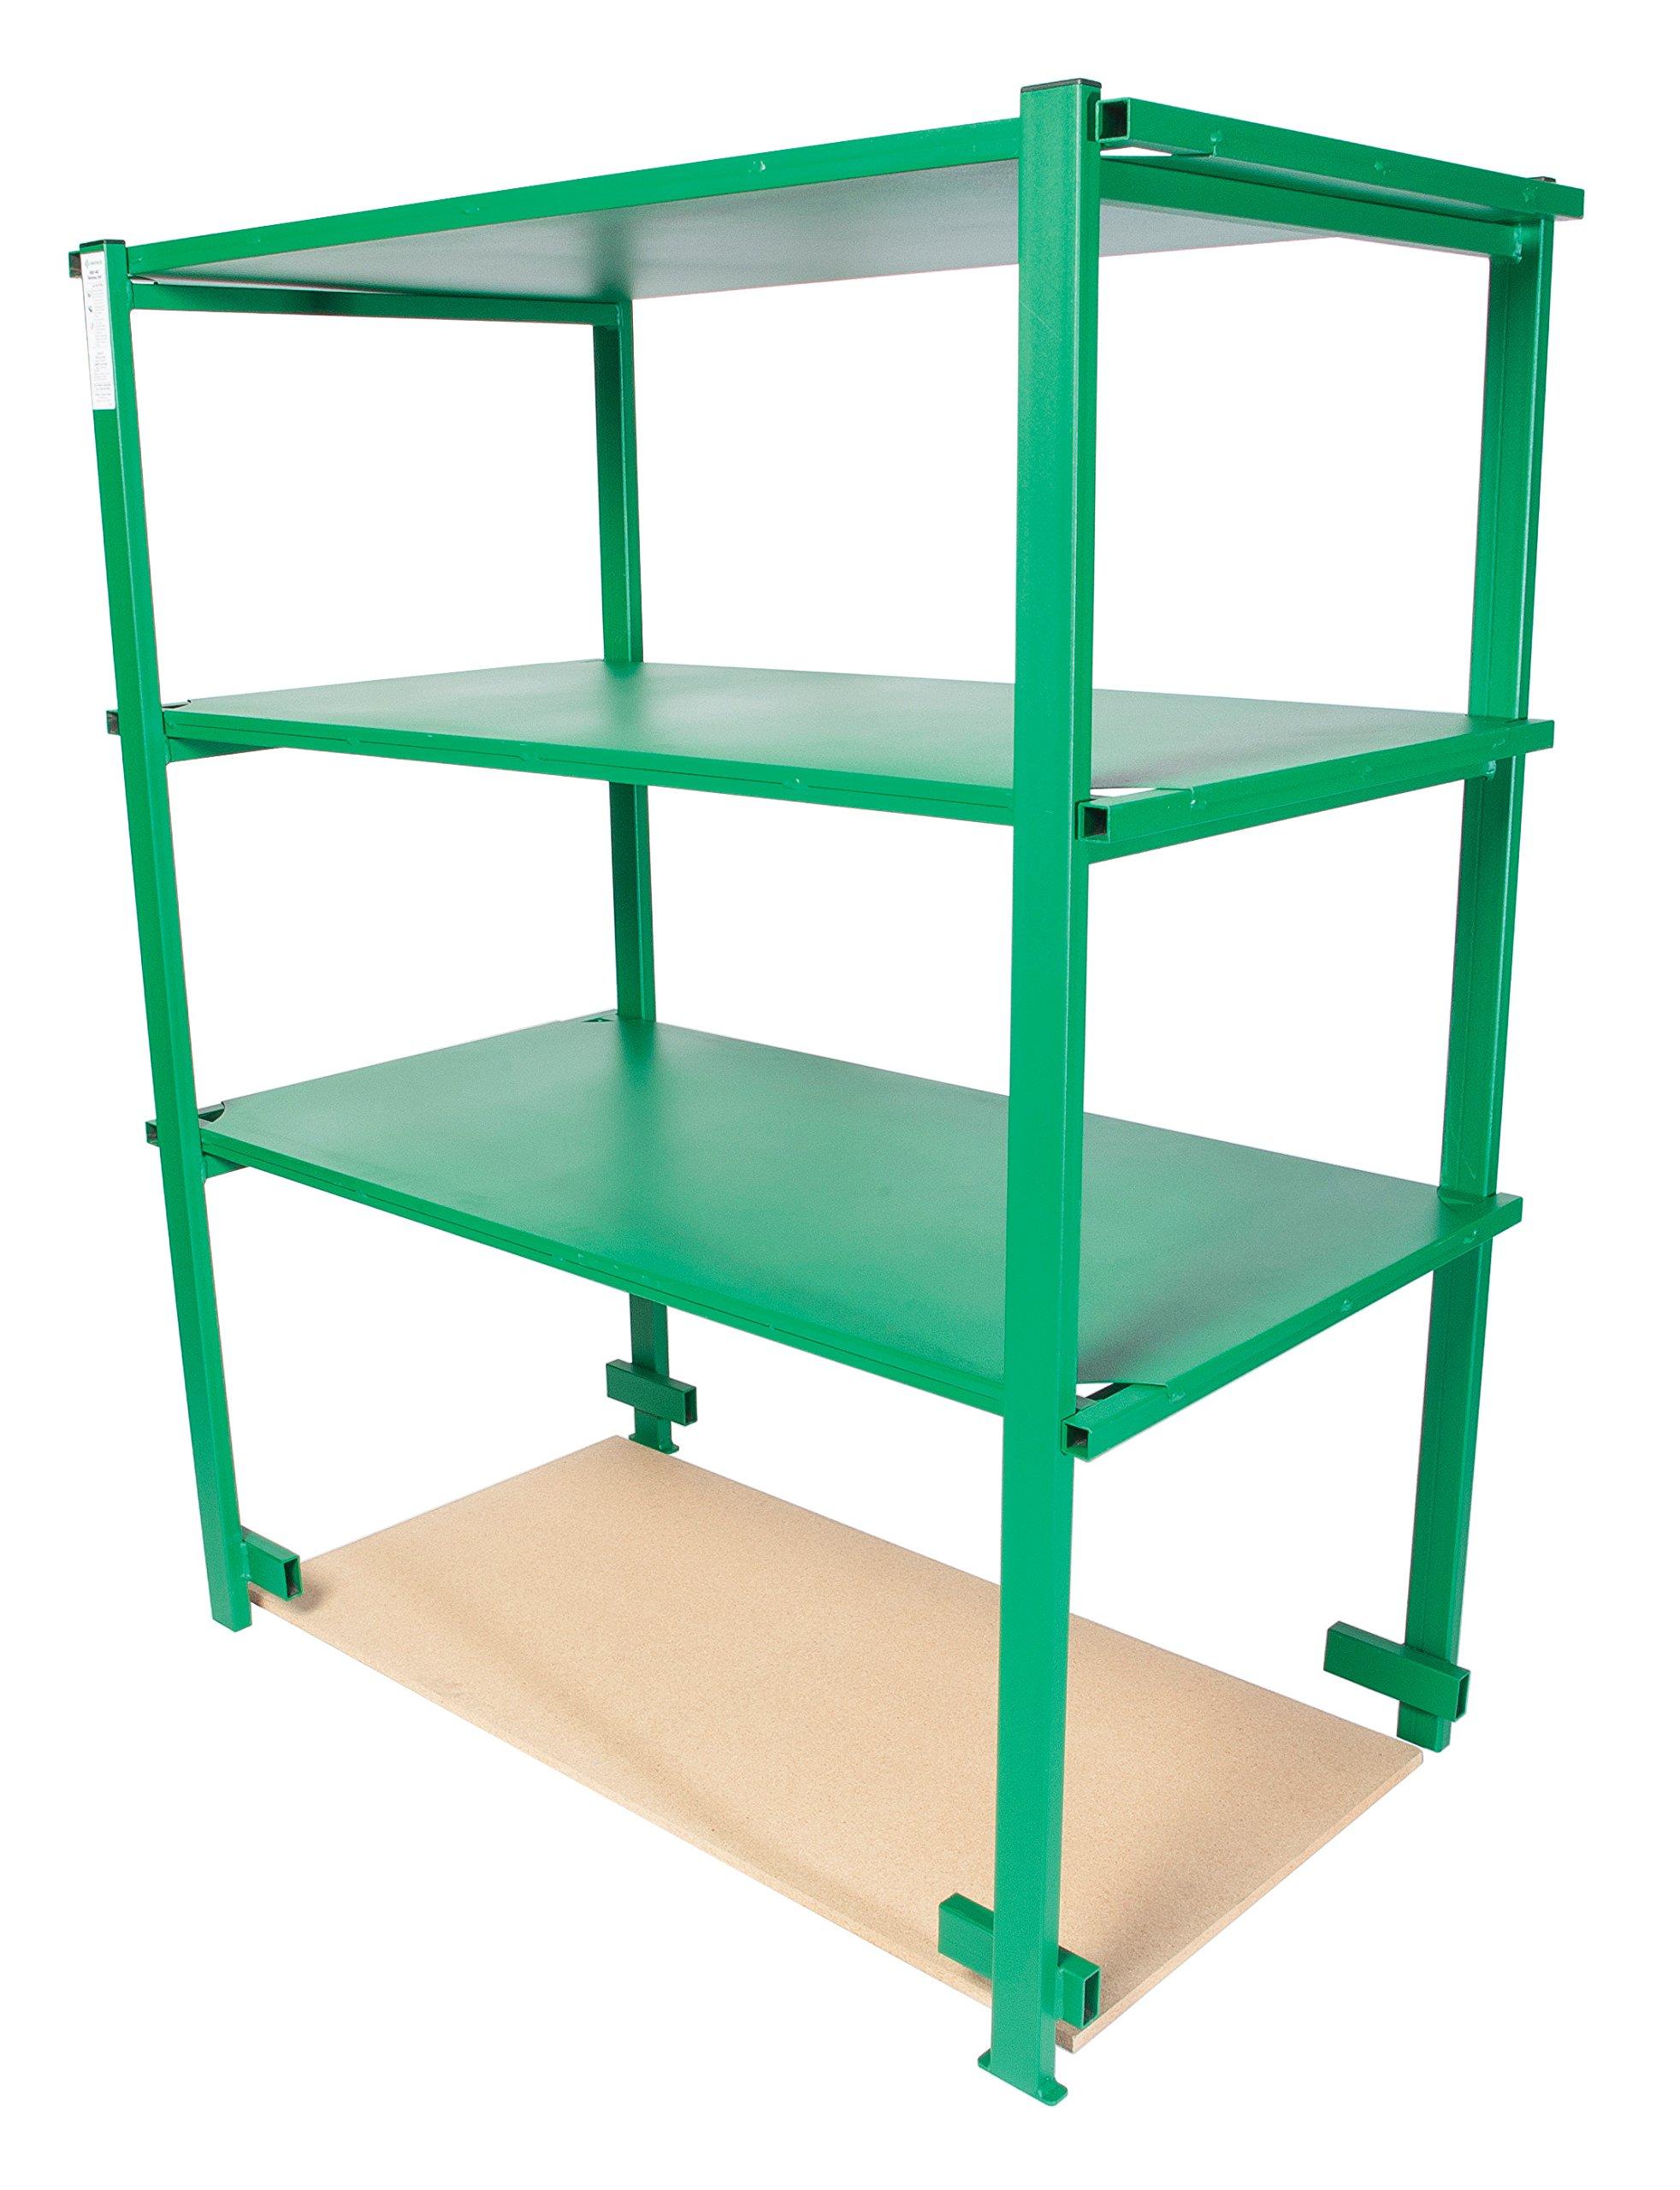 Greenlee GMX-663 Shelf Unit, 4 Tier